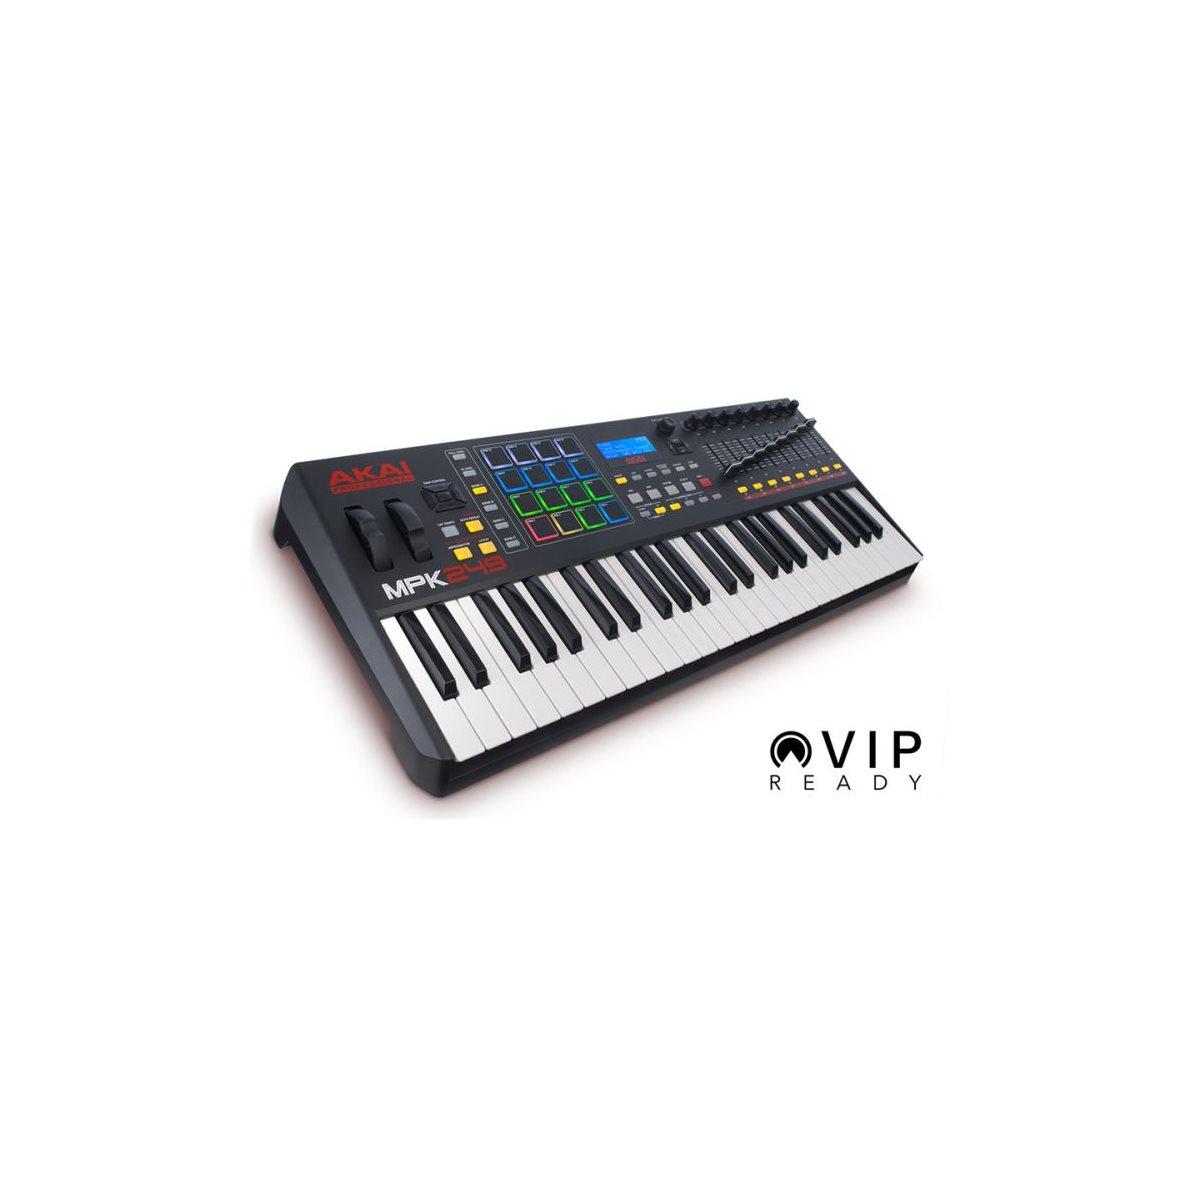 AKAI - MPK249 - Performance Keyboard Controller